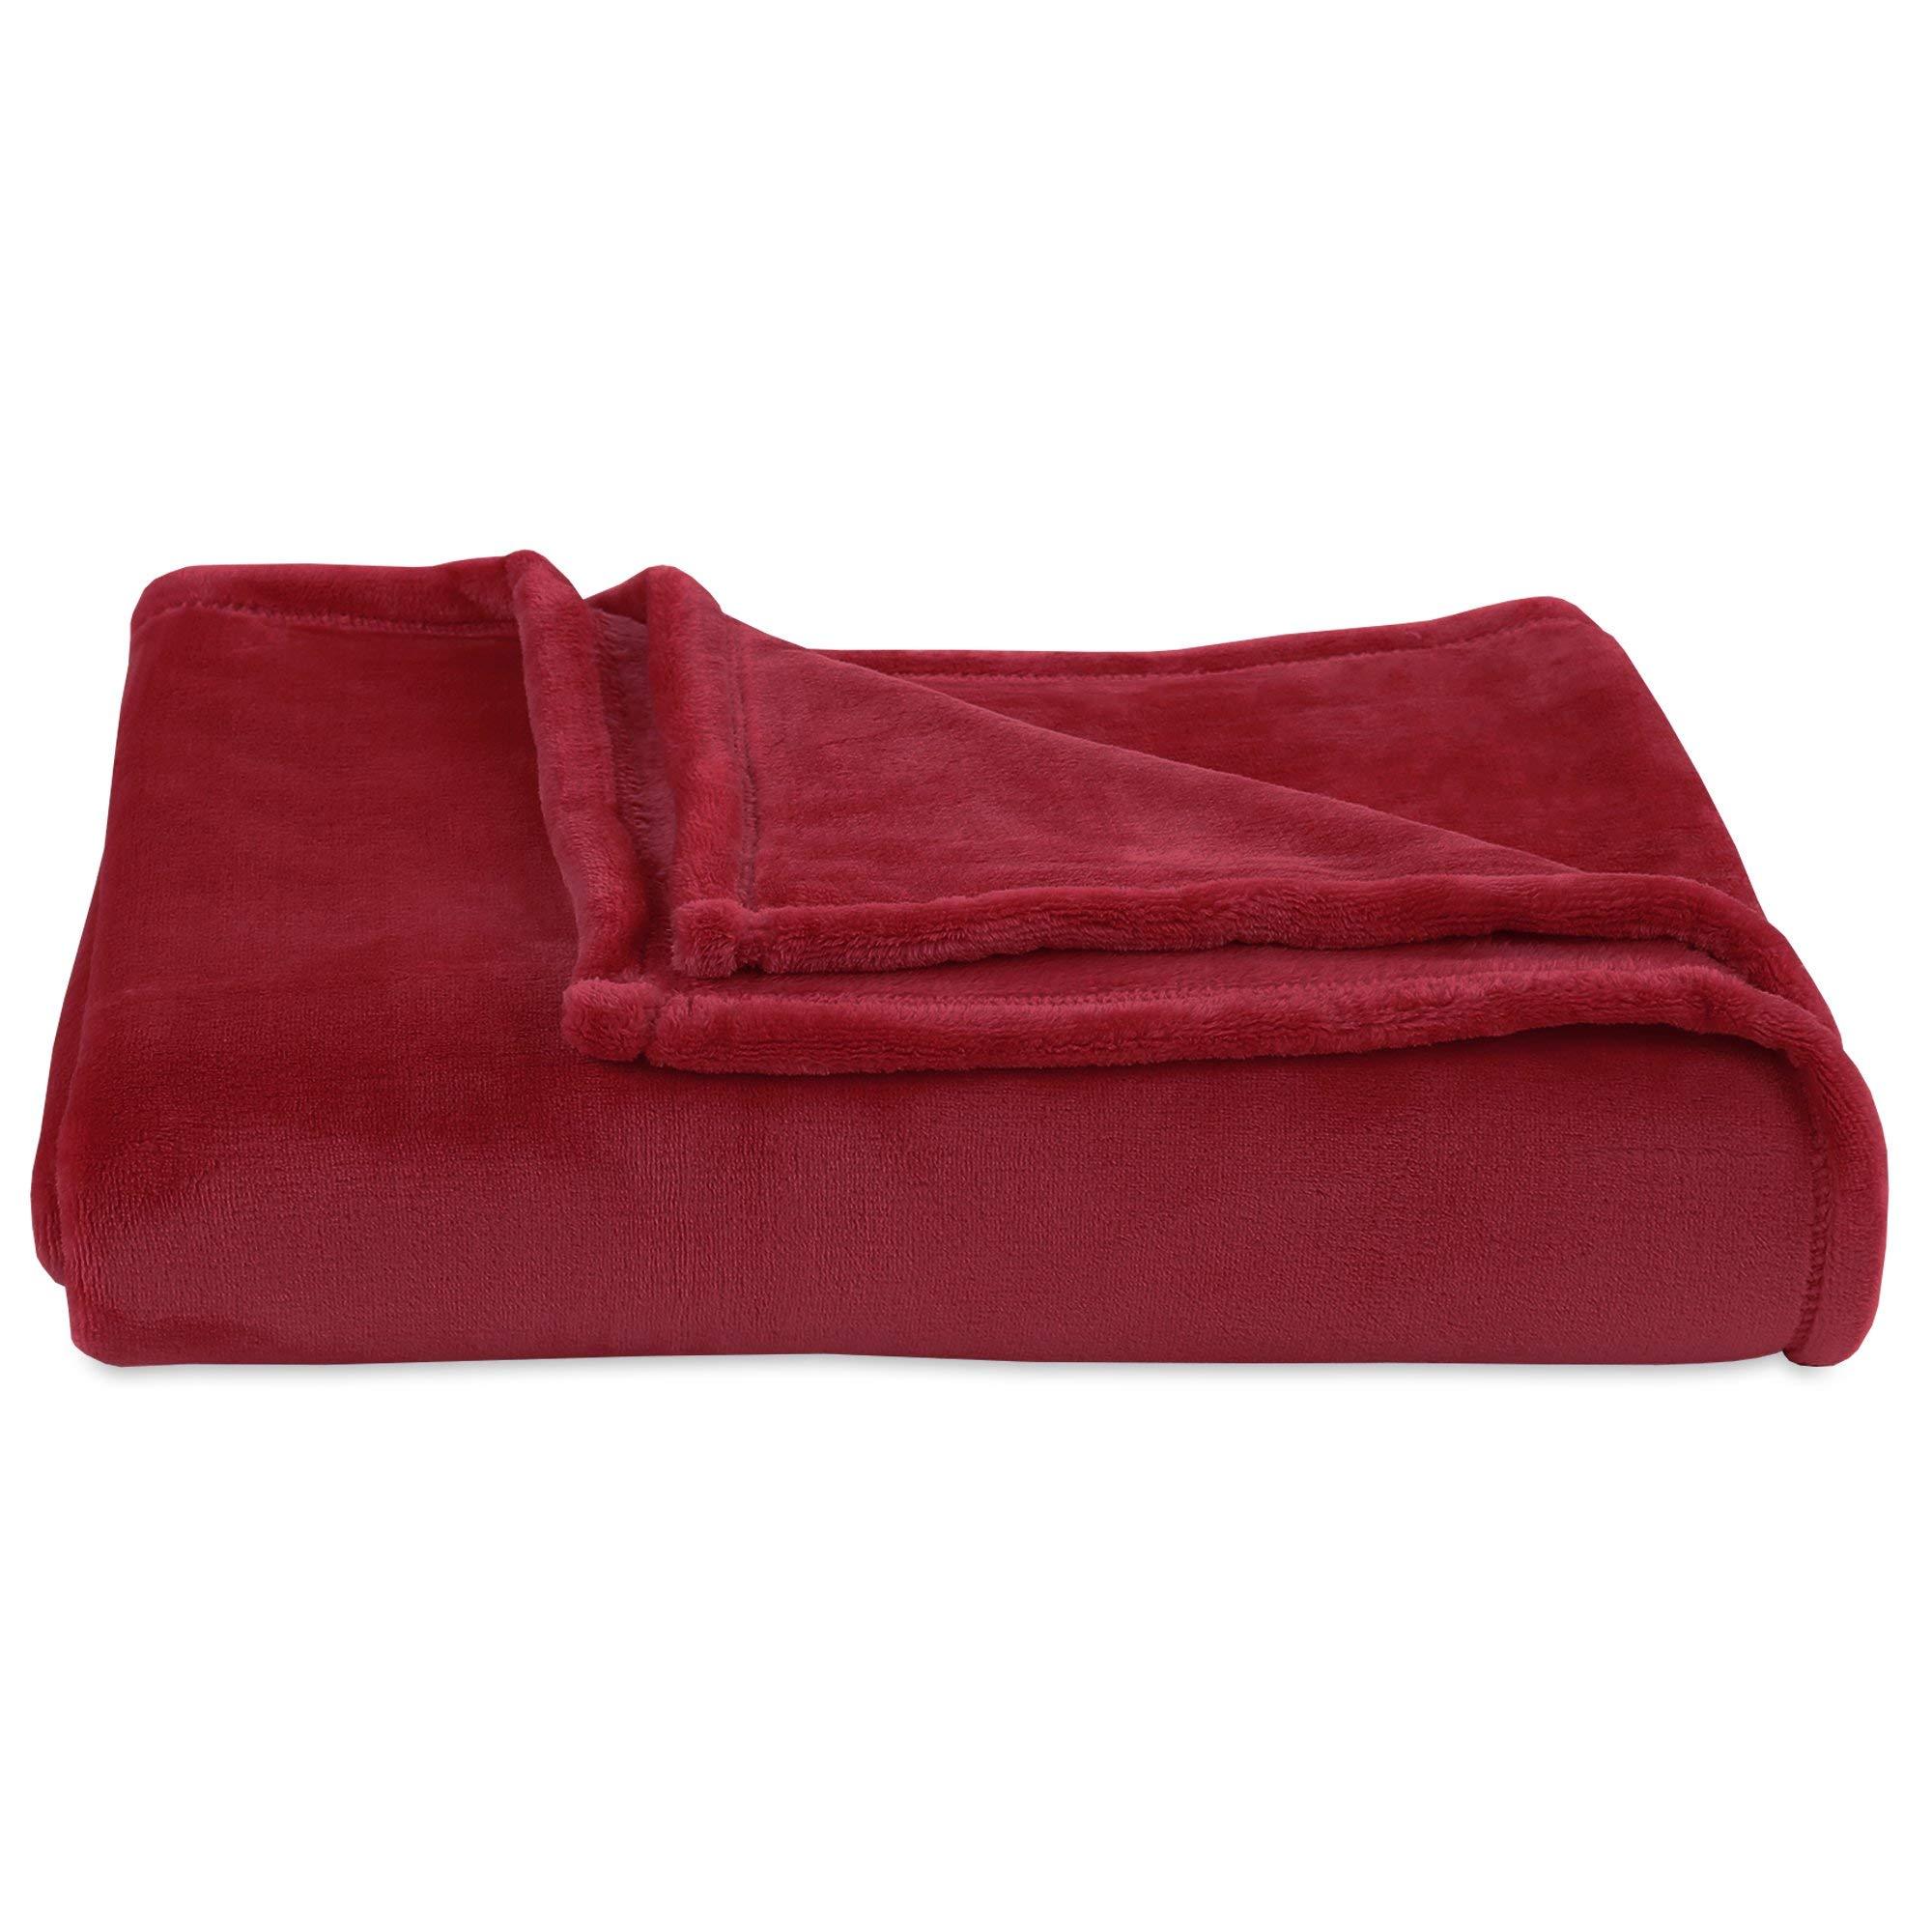 "Berkshire Blanket VelvetLoft Ultra Soft Cozy Warm Luxury Plush Throw Blanket, Rustic Red, 60"" x 70"""